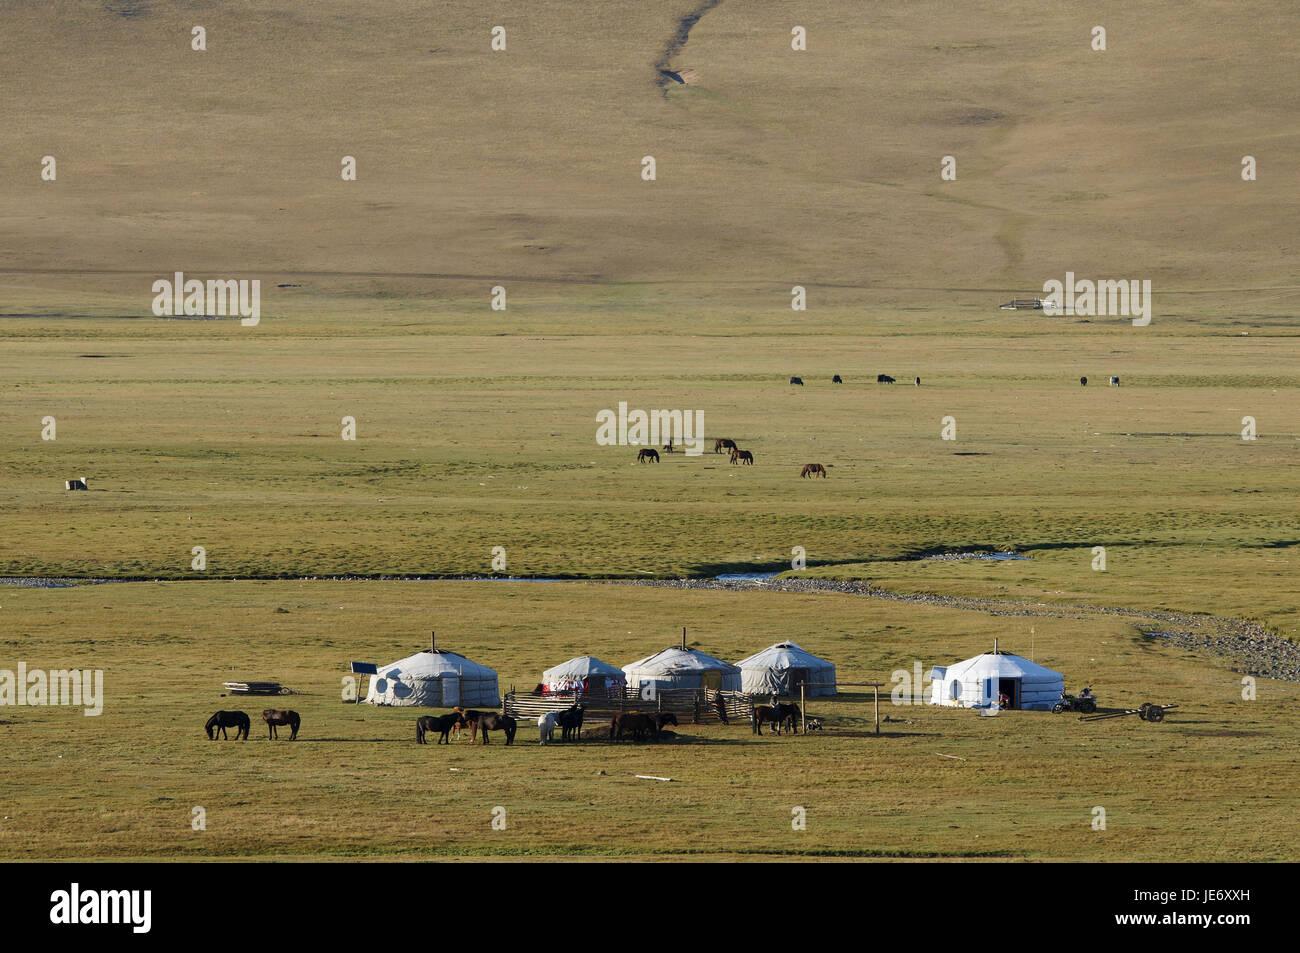 Mongolei, Zentralasien, Provinz Arkhangai, Nomad, Support, Jurten, Stockfoto